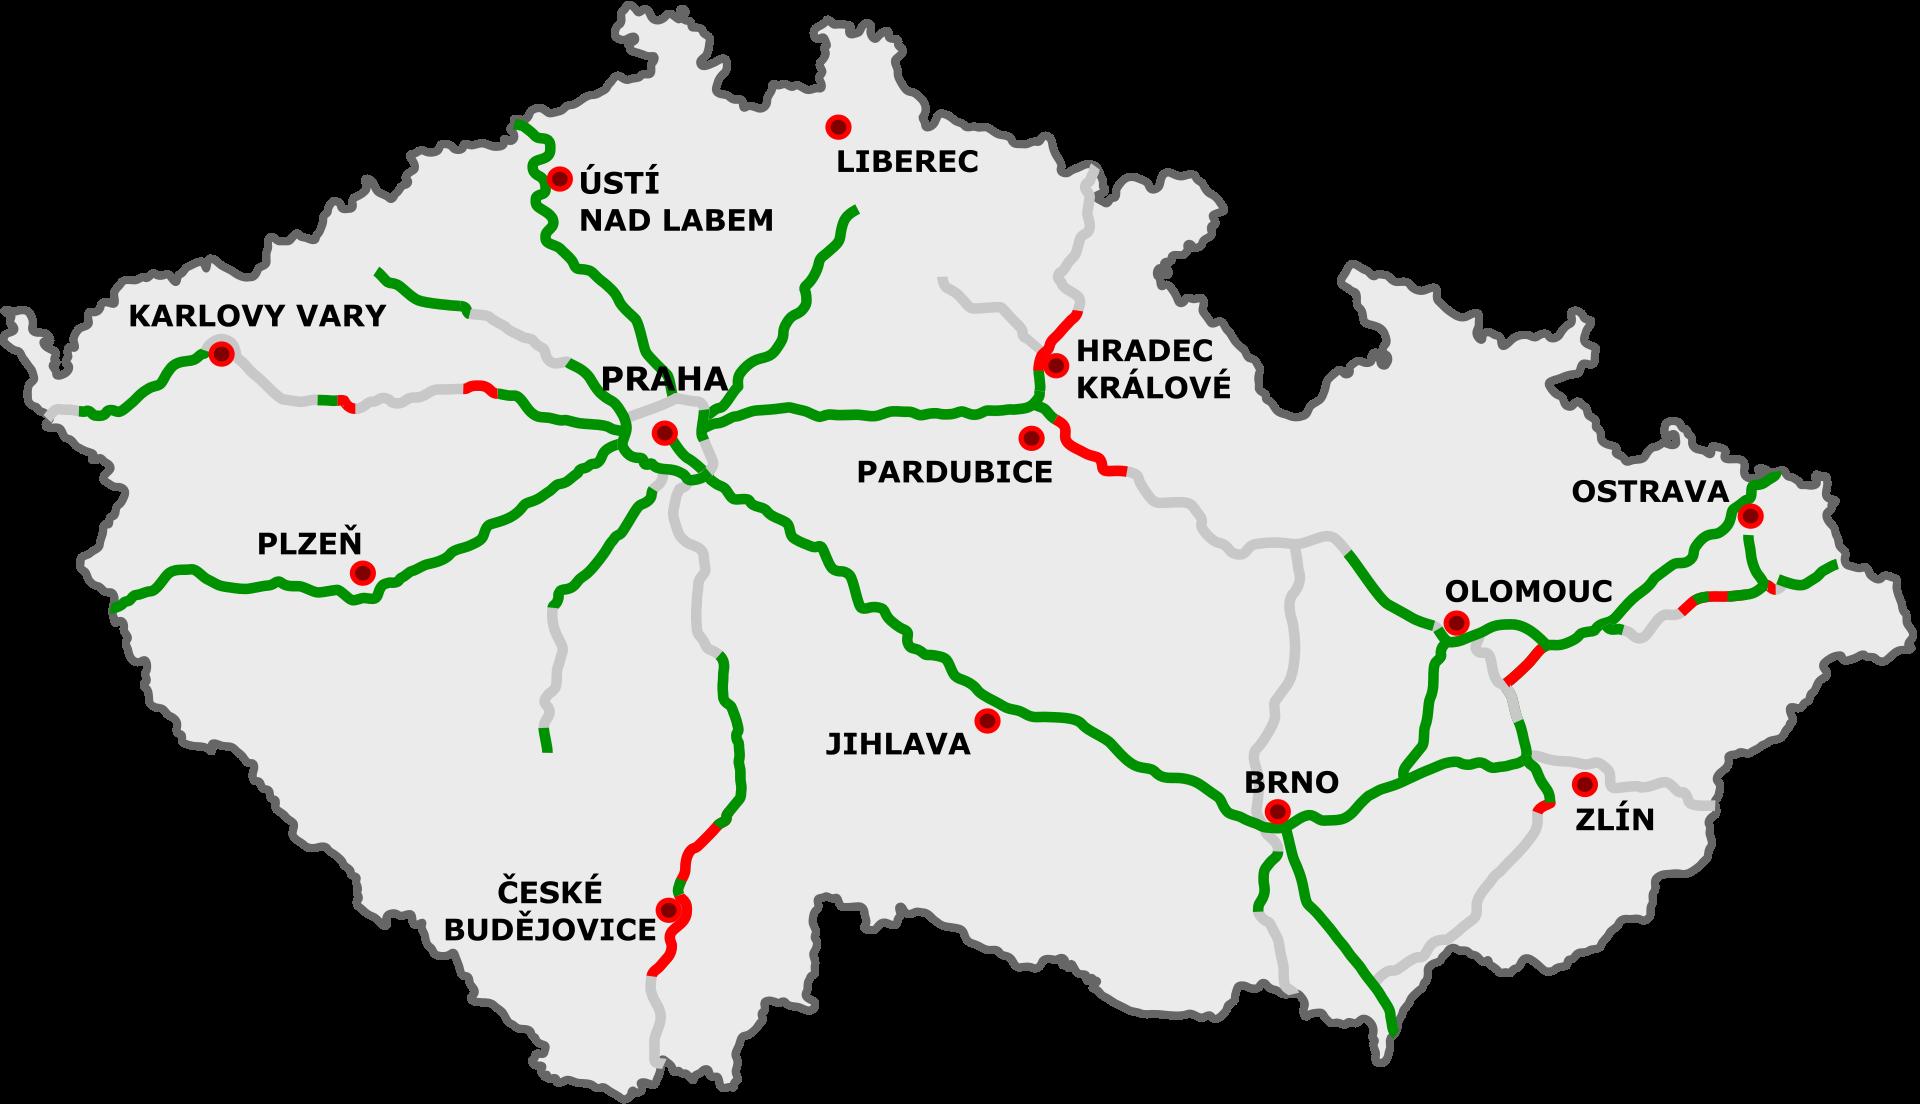 Highways in Czech Republic / Current map / Source: Wikipedia.